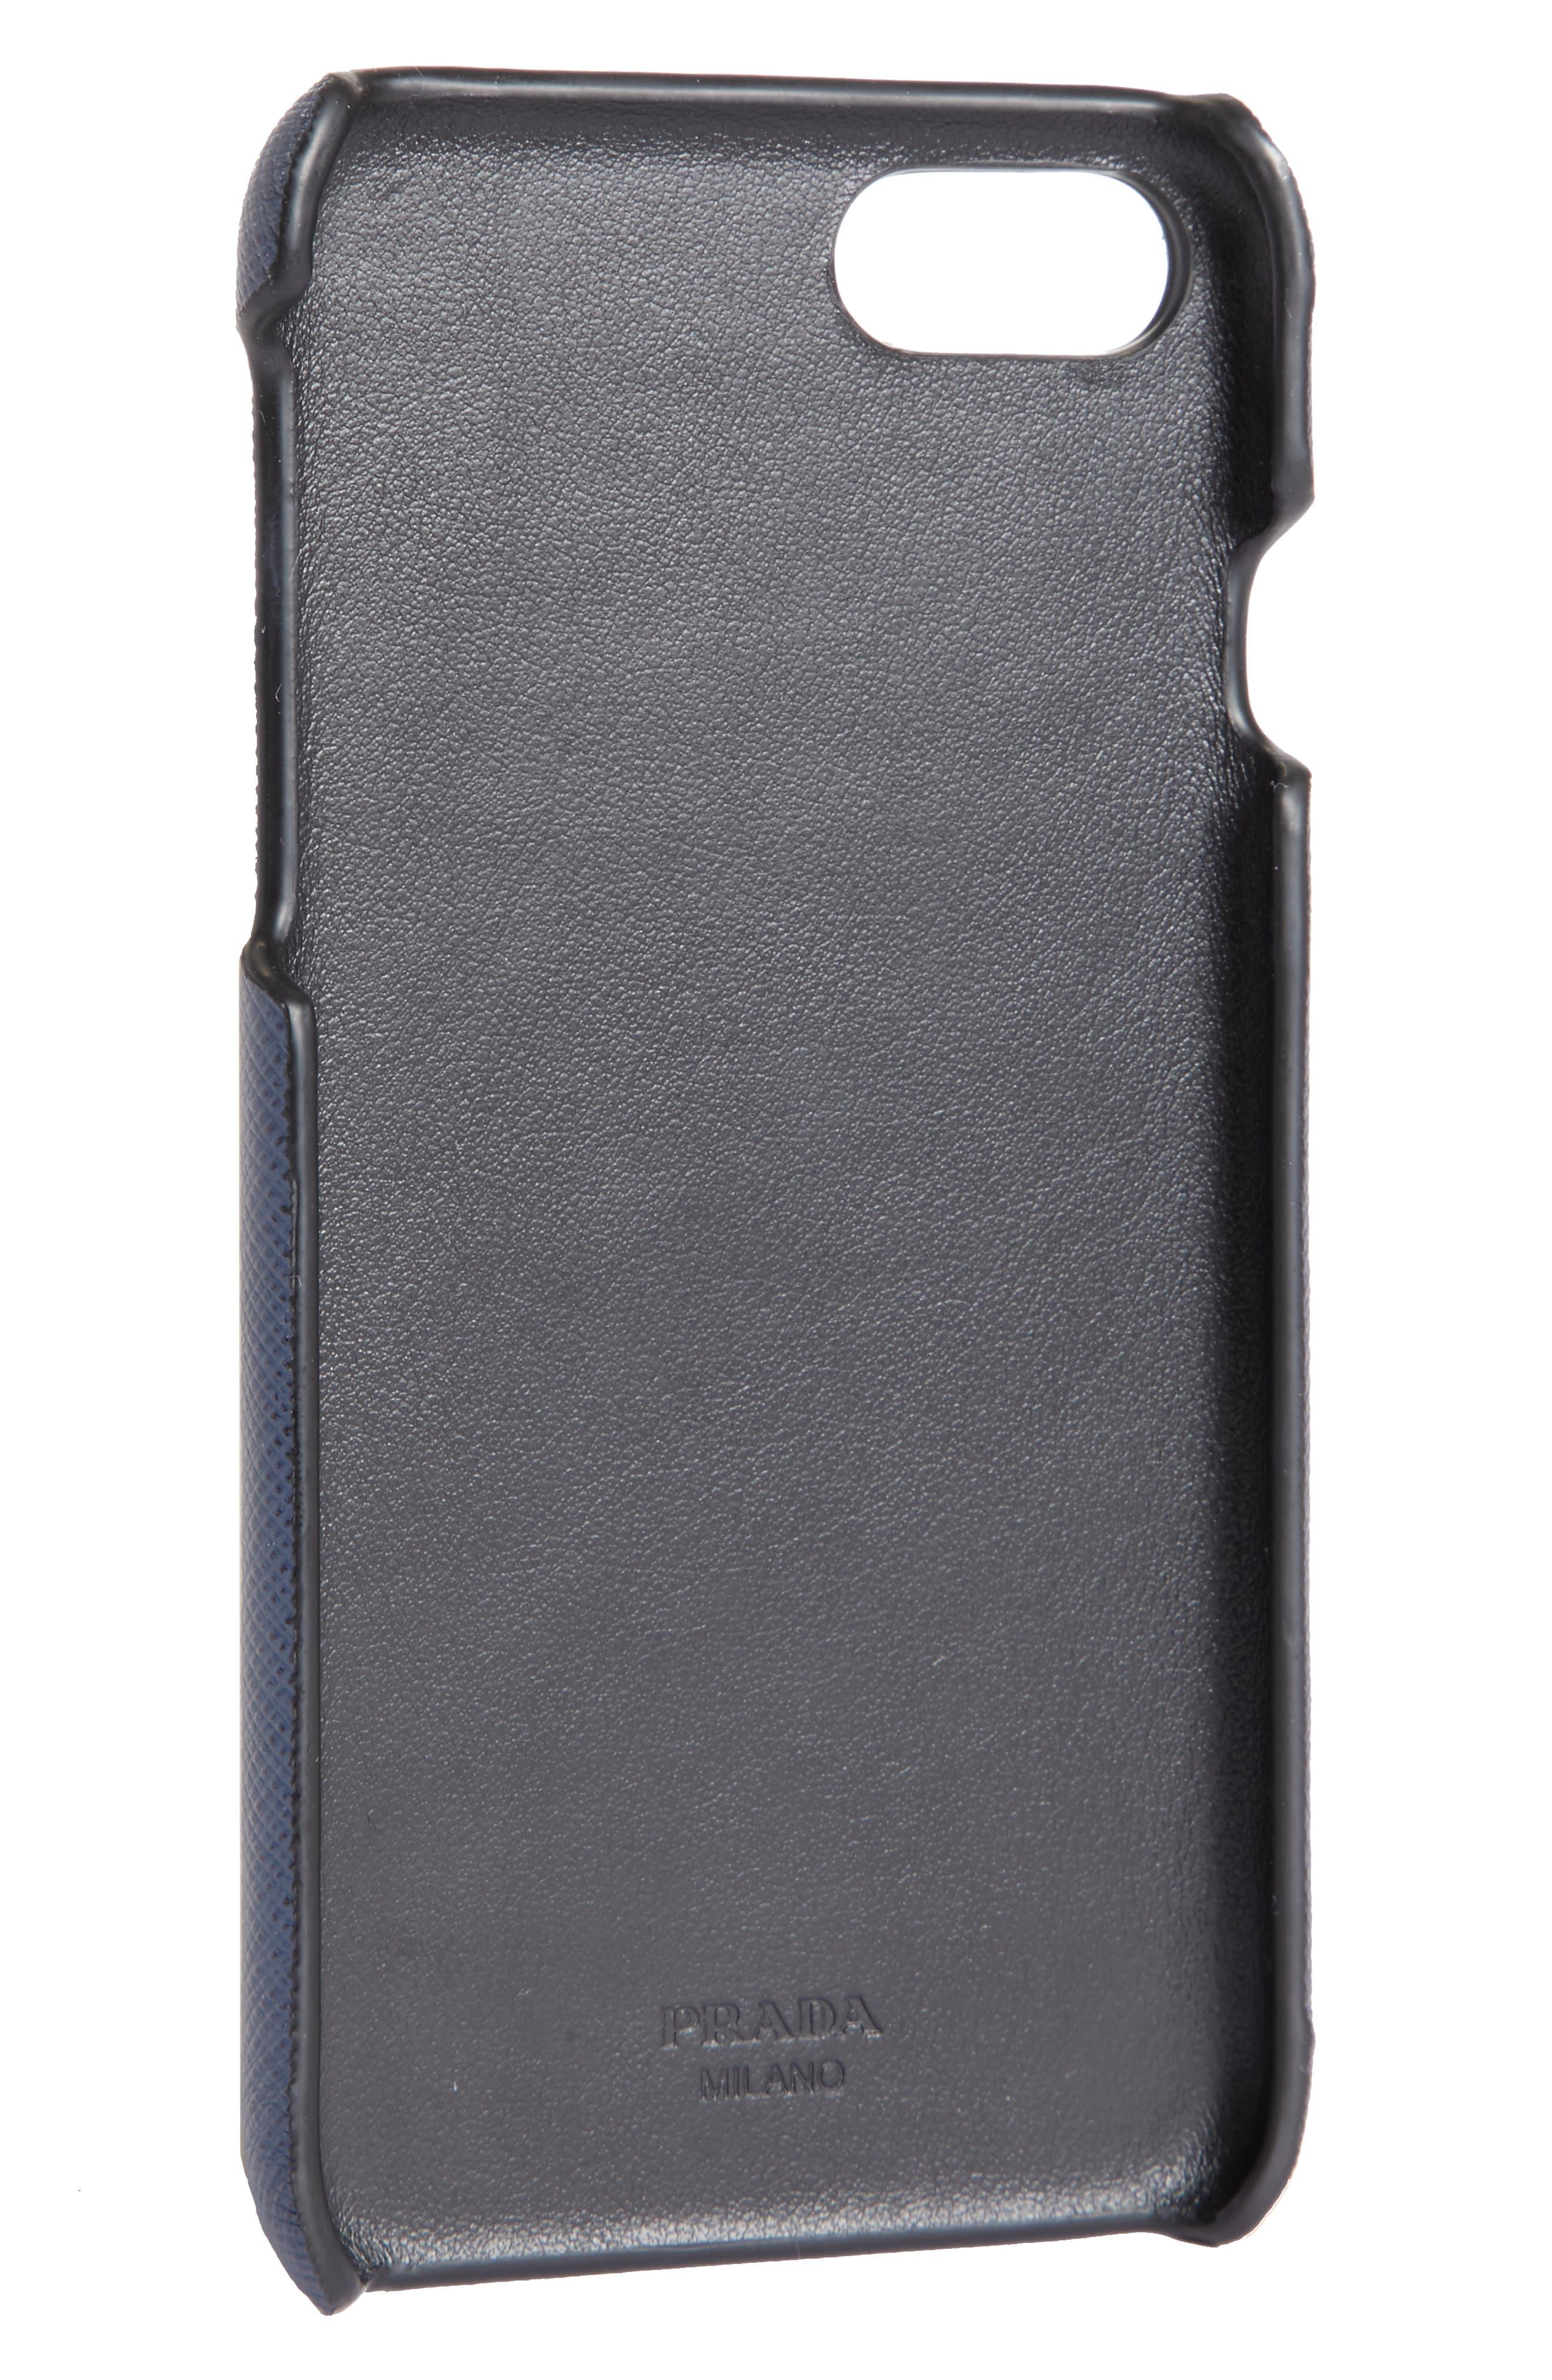 Alternate Image 2  - Prada Saffiano Leather iPhone 6/6s/7/8 Case